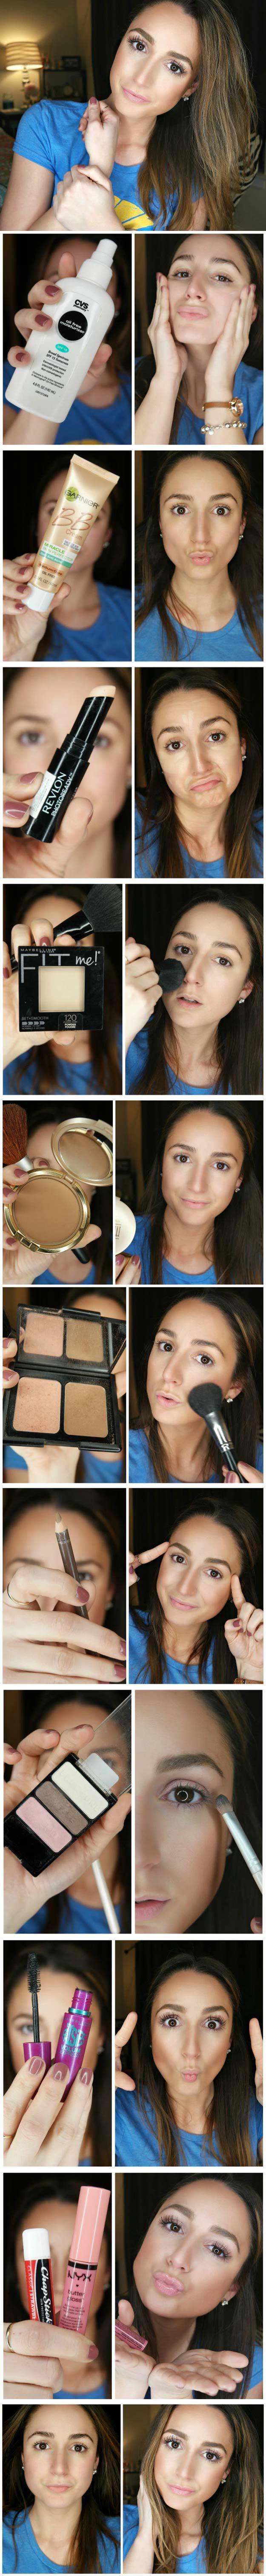 Best Makeup Tutorials for Teens -5 Minute Everyday Makeup Routine - Easy Makeup ...